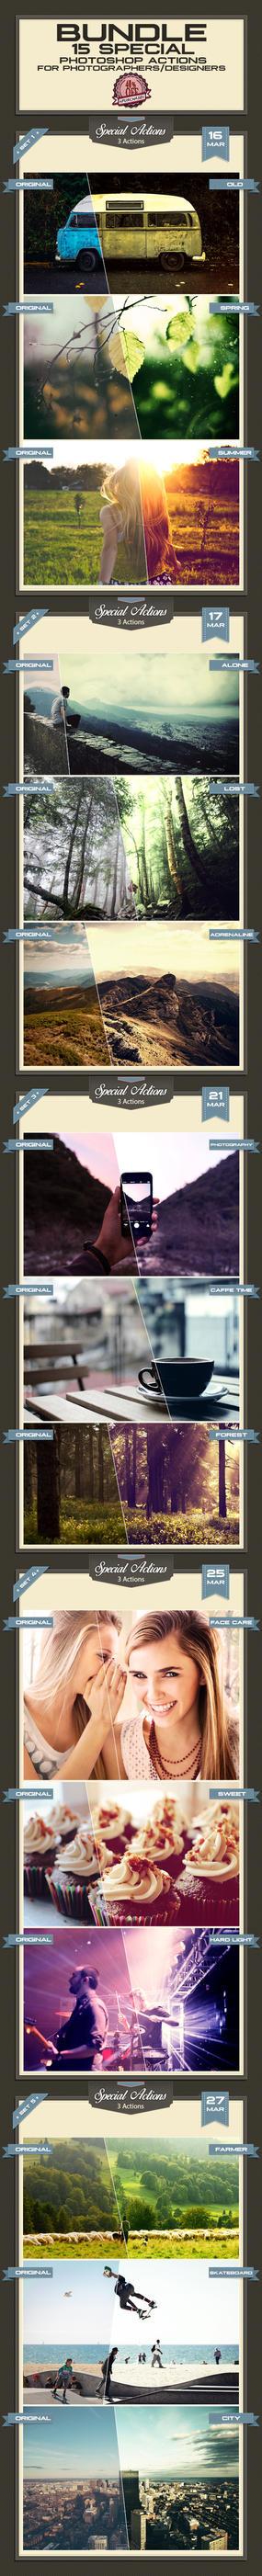 Special Photoshop Action Bundle I by baturaN